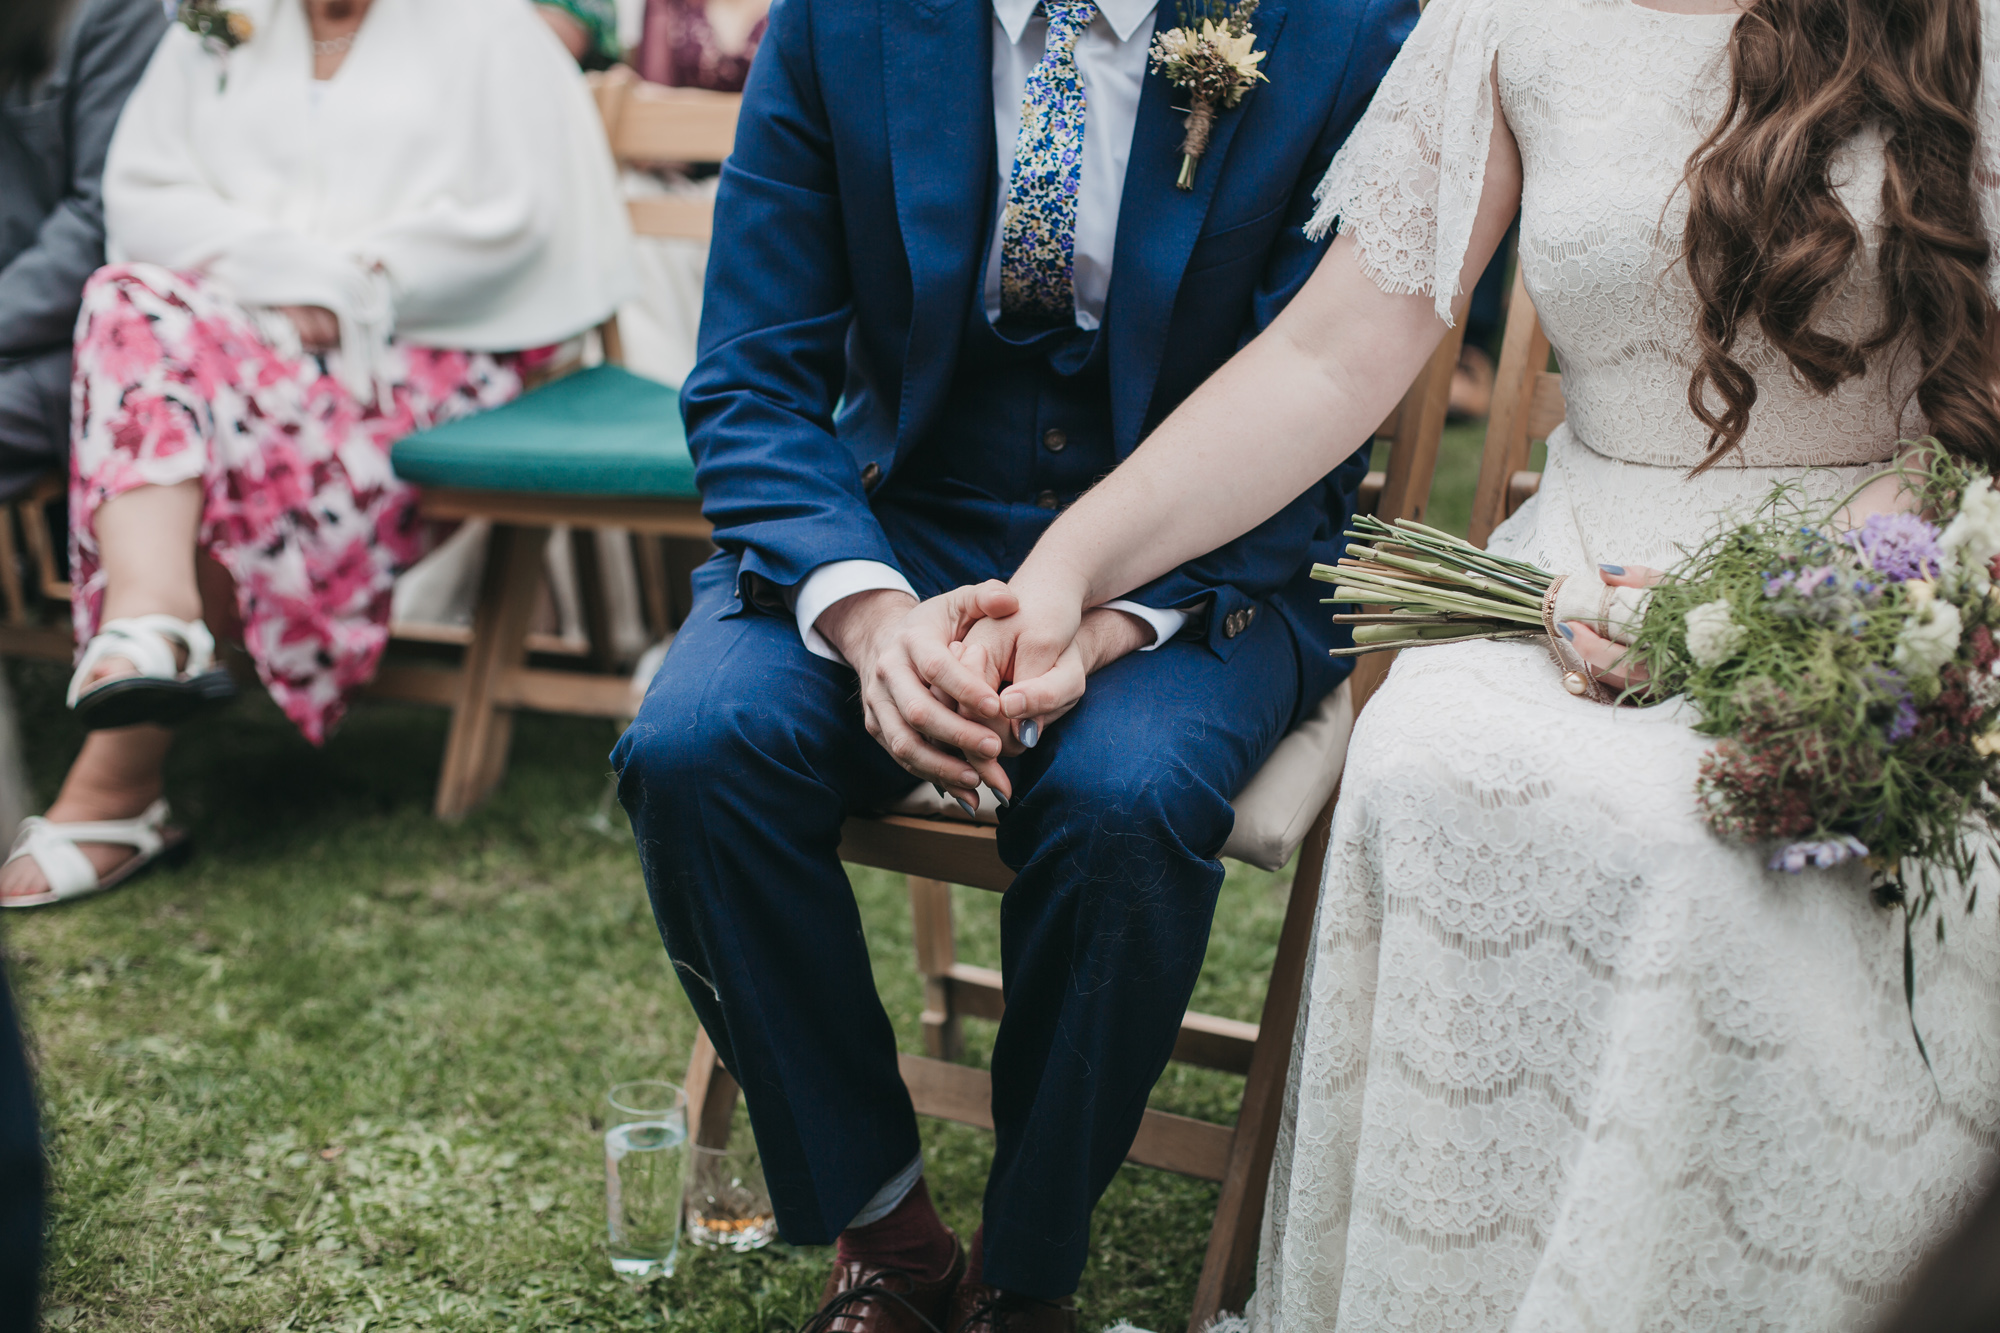 Kristy-Back-Garden-Outdoor-Wedding-Sheffield-Industrial-Warehouse-Wedding-Bohemian-Kate-Beaumont-Dahlia-Dress-17.jpg